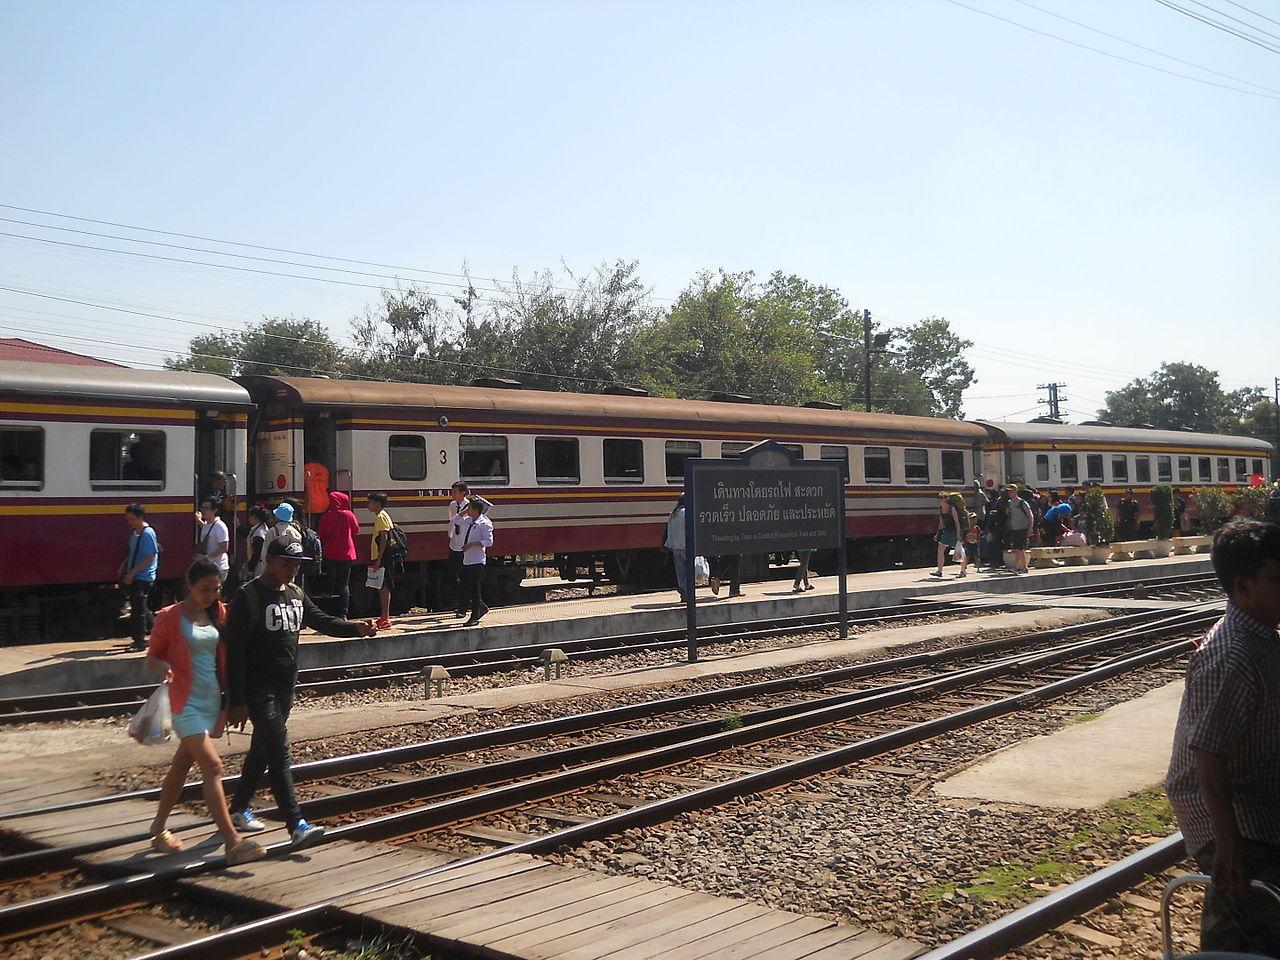 121 Train Services Suspended to Control COVID